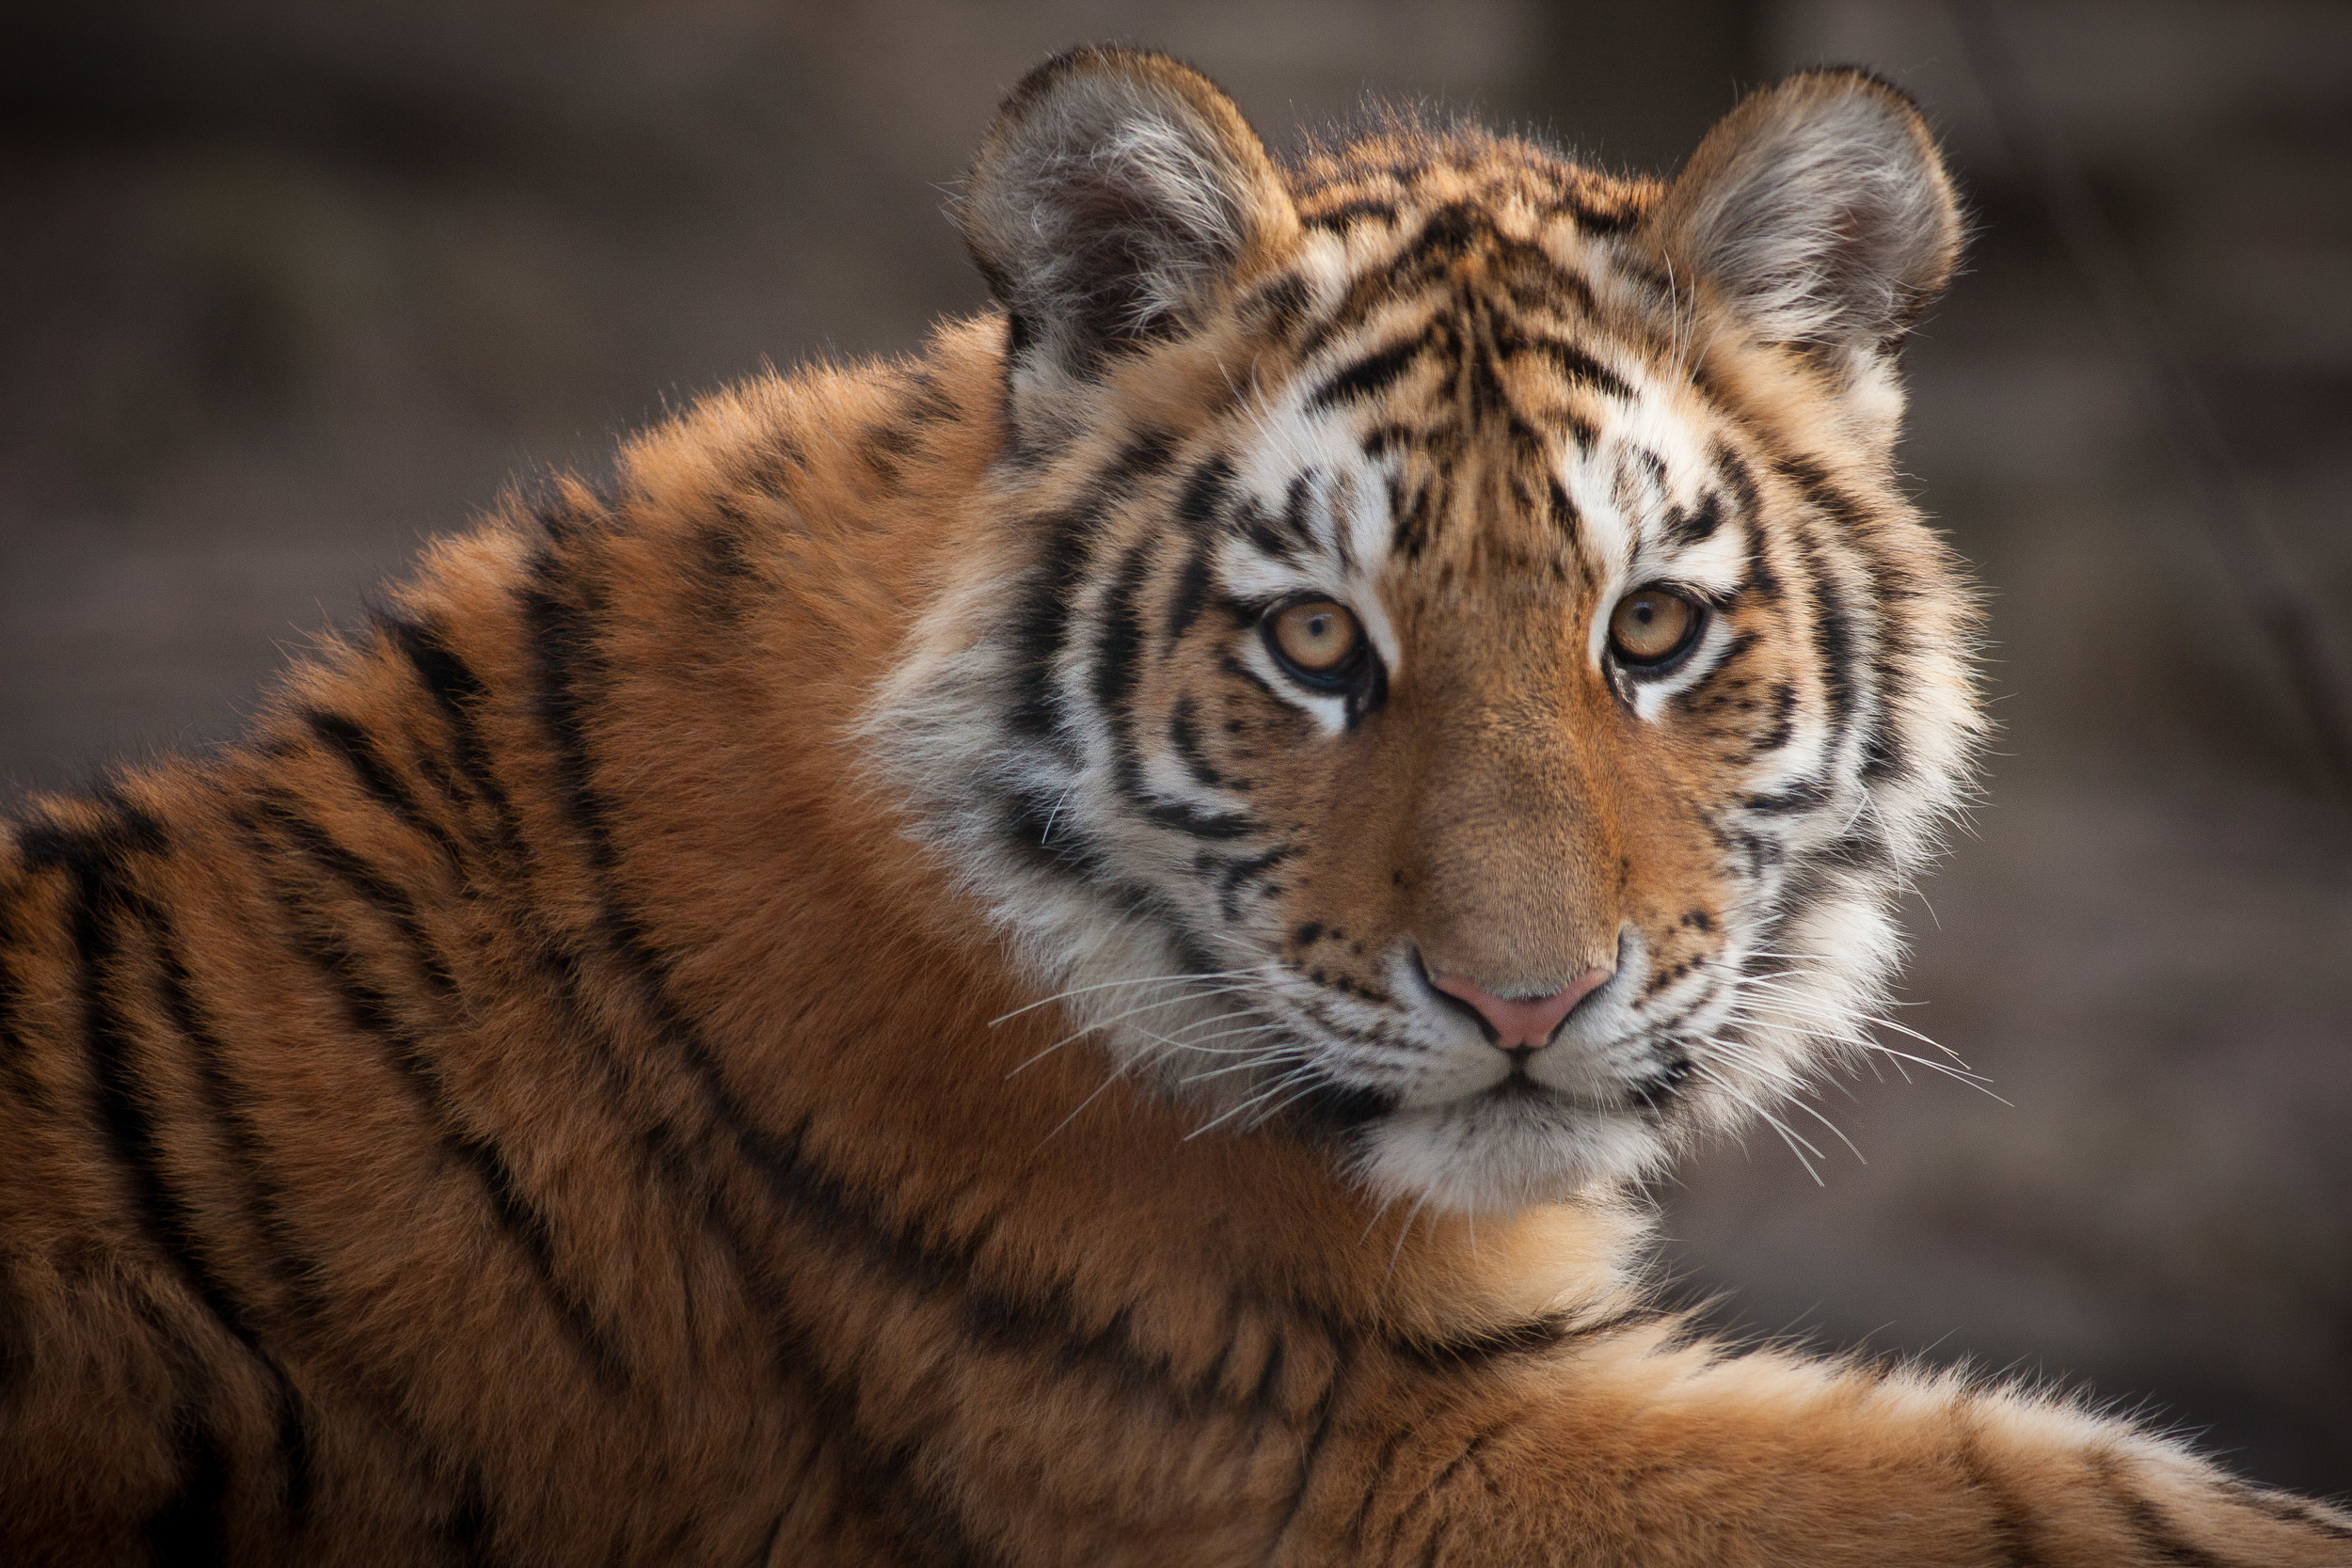 tiger-portrait.jpg